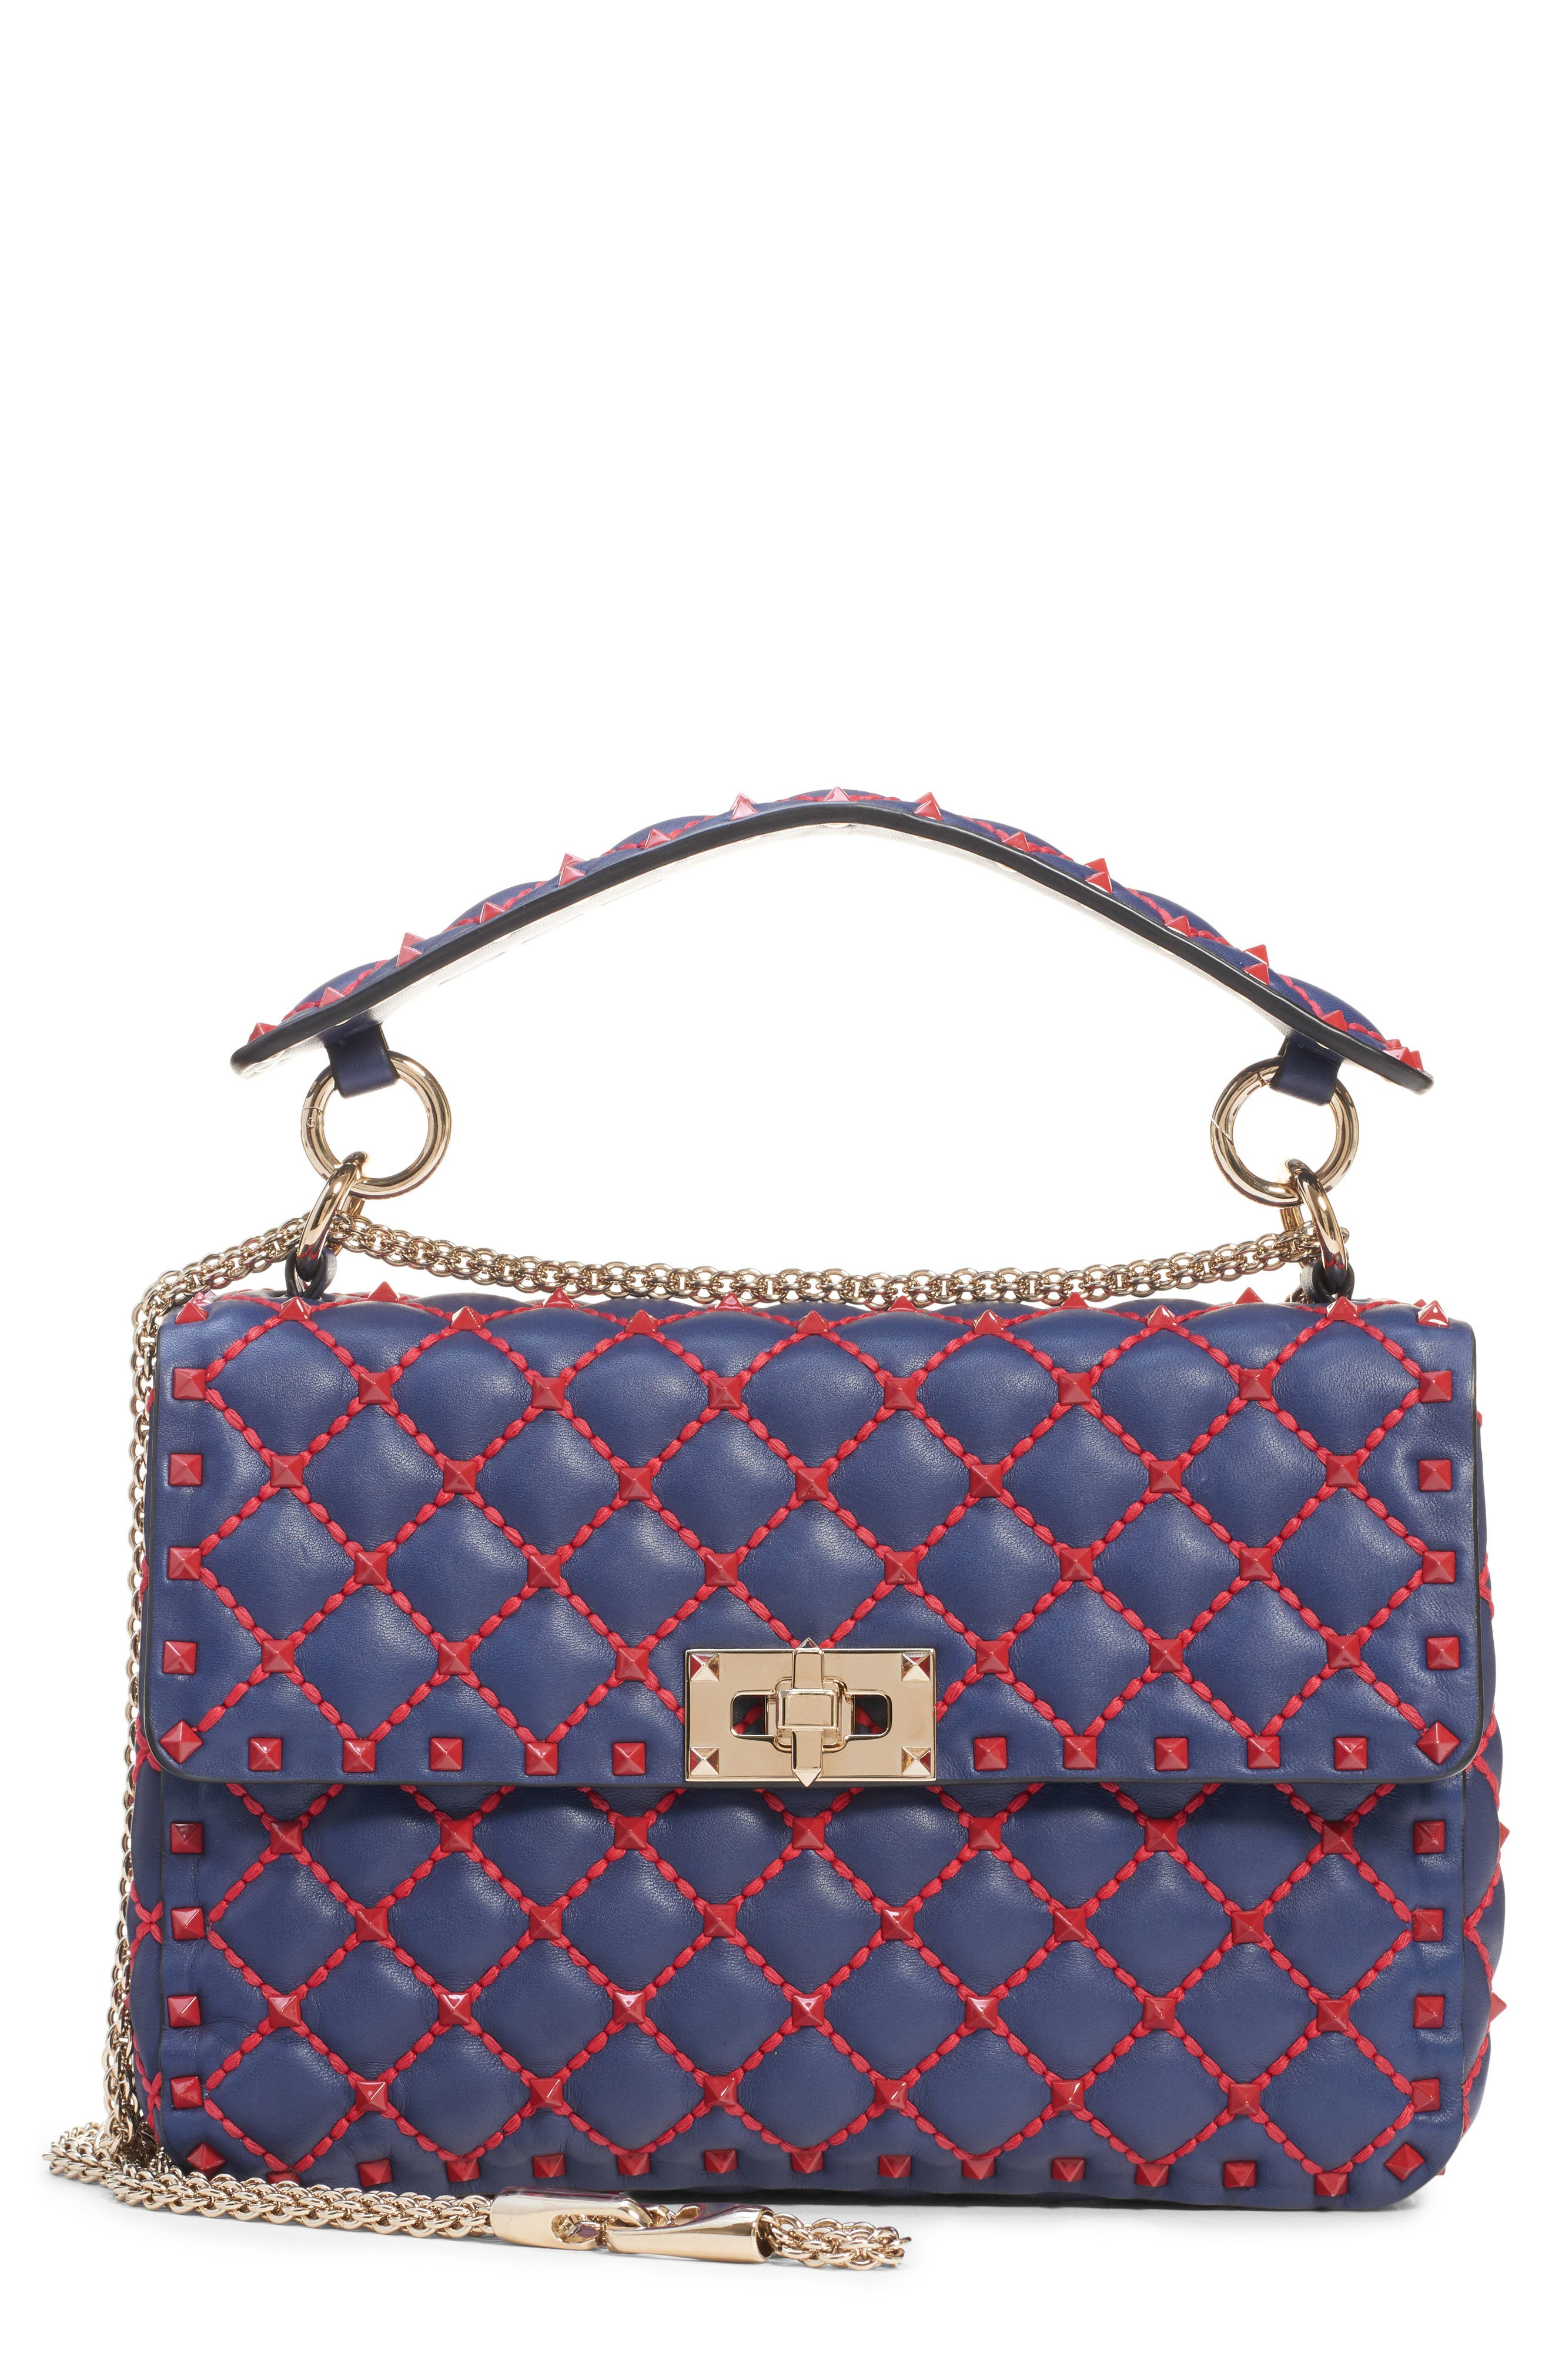 Medium Spike.It Leather Shoulder Bag, Main, color, PURE BLUE/ ROSSO